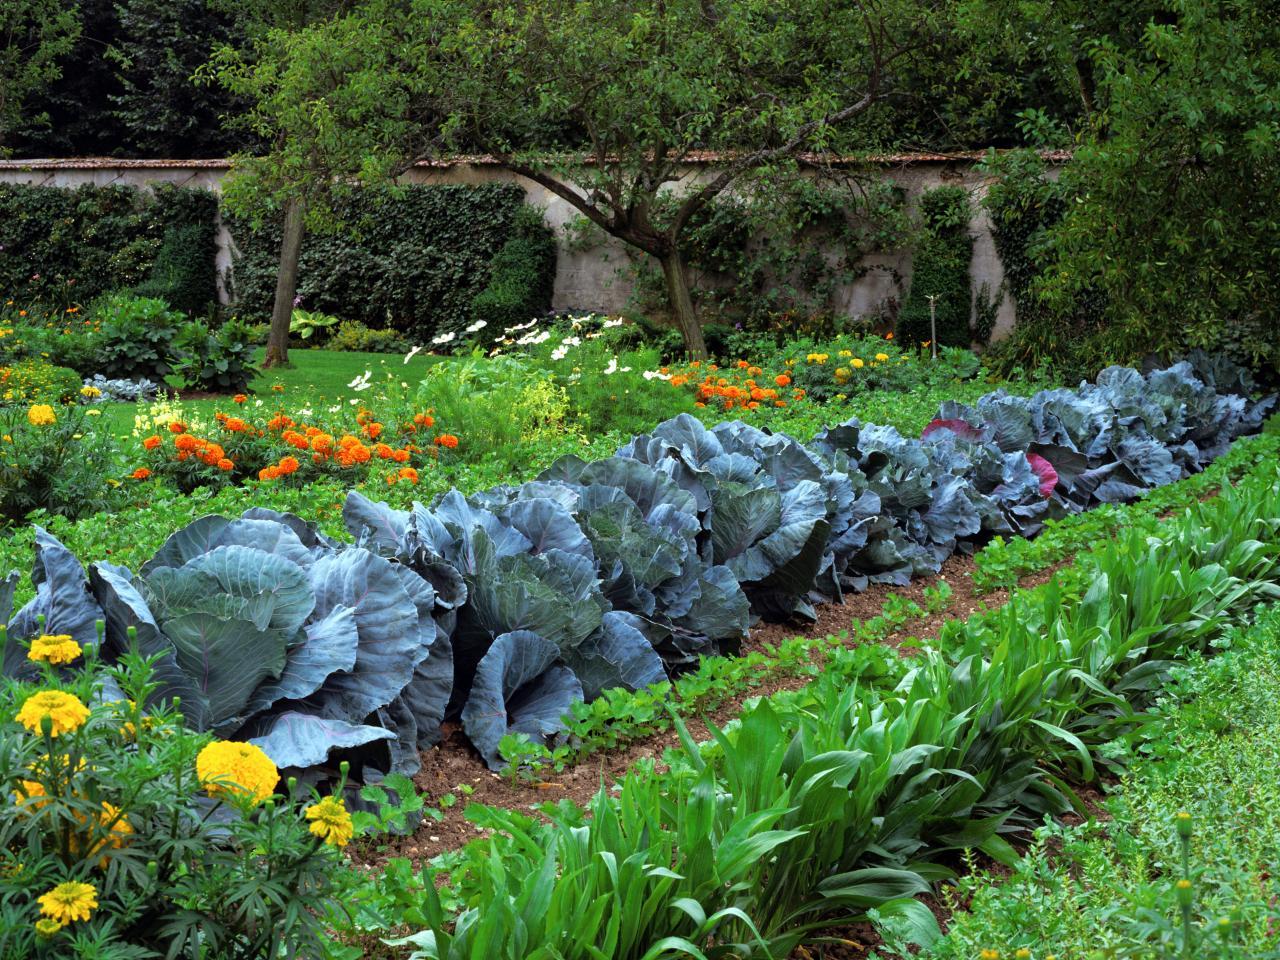 RX-DK-CGG03704_rows-of-vegetables_s4x3.jpg.rend.hgtvcom.1280.960